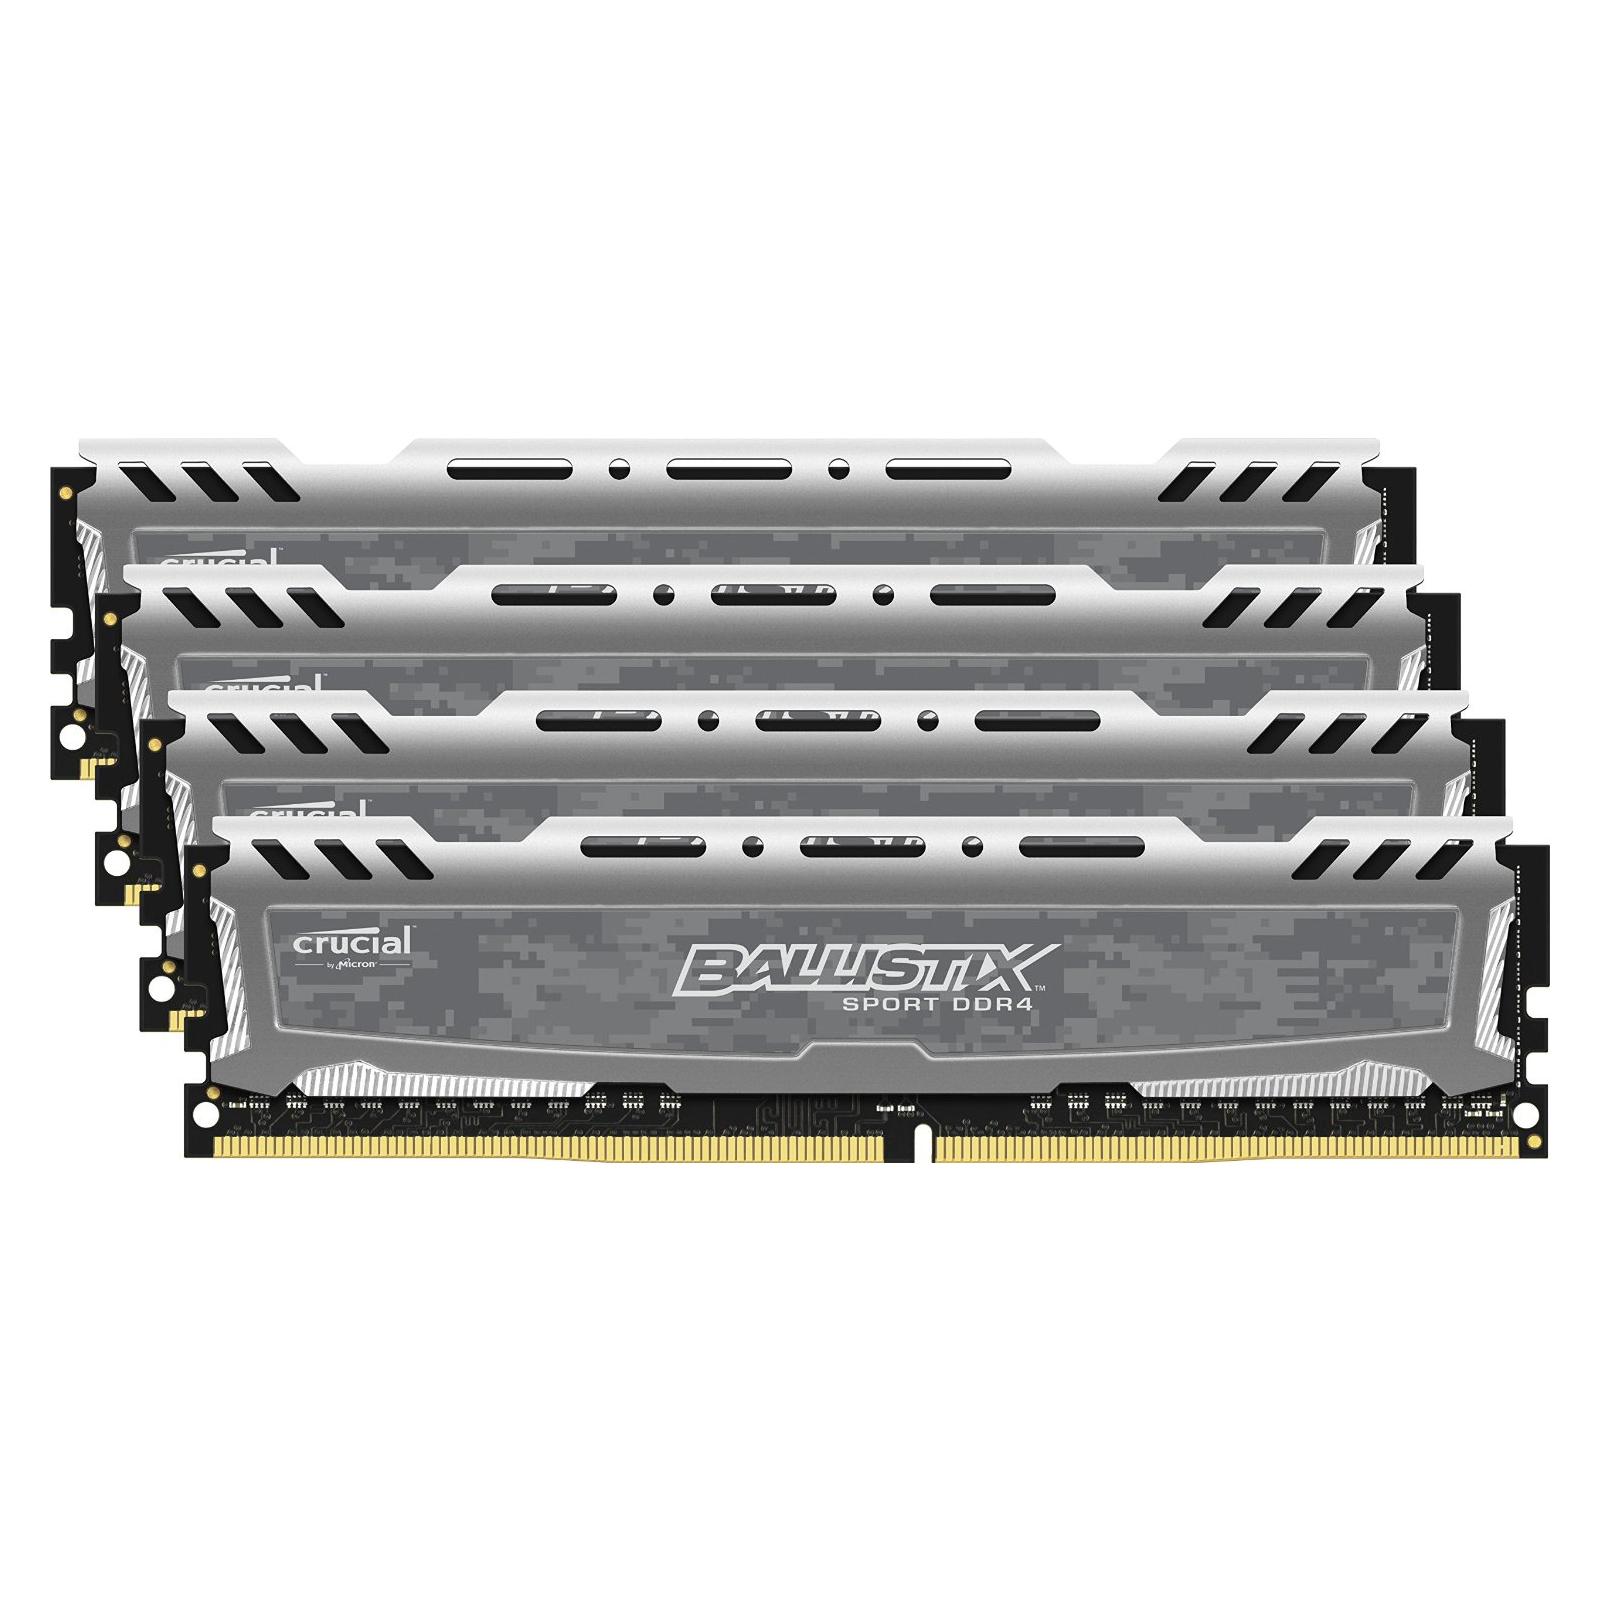 Модуль памяти для компьютера DDR4 16GB (4x4GB) 2400 MHz Ballistix Sport MICRON (BLS4C4G4D240FSB) изображение 2